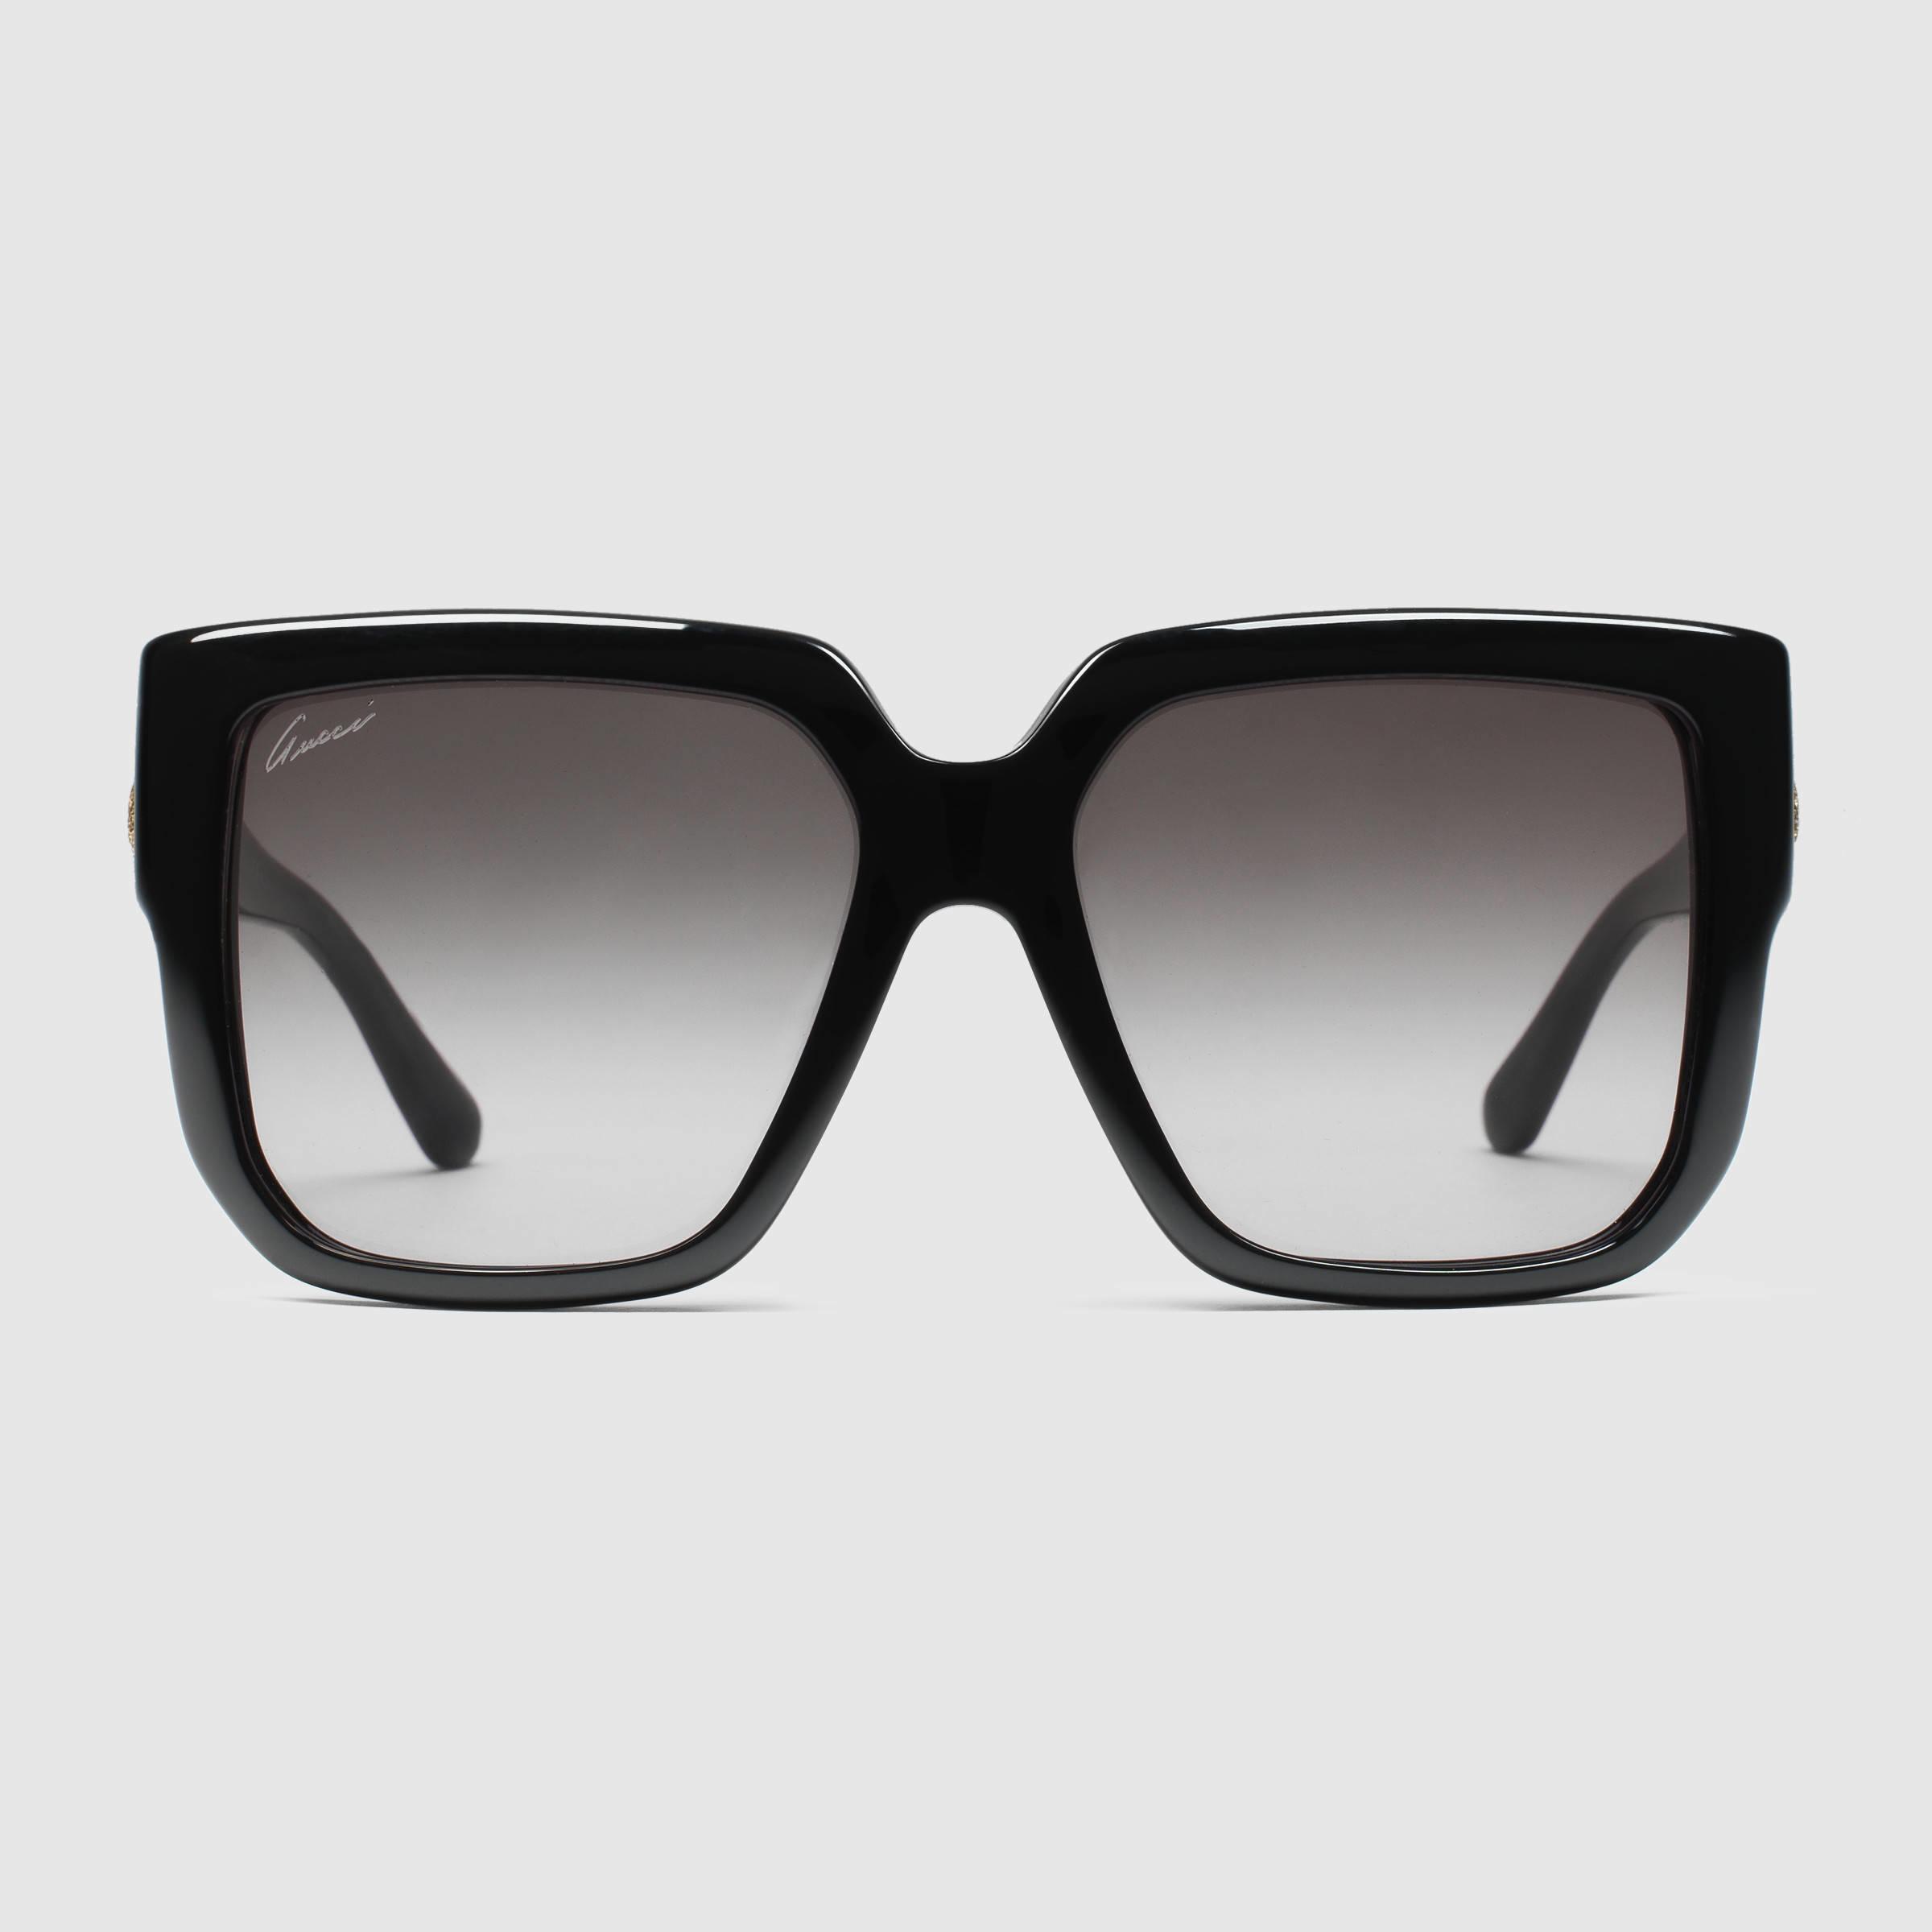 c6716e0b6afc7 Gucci Oversized Square-frame Sunglasses in Black - Lyst